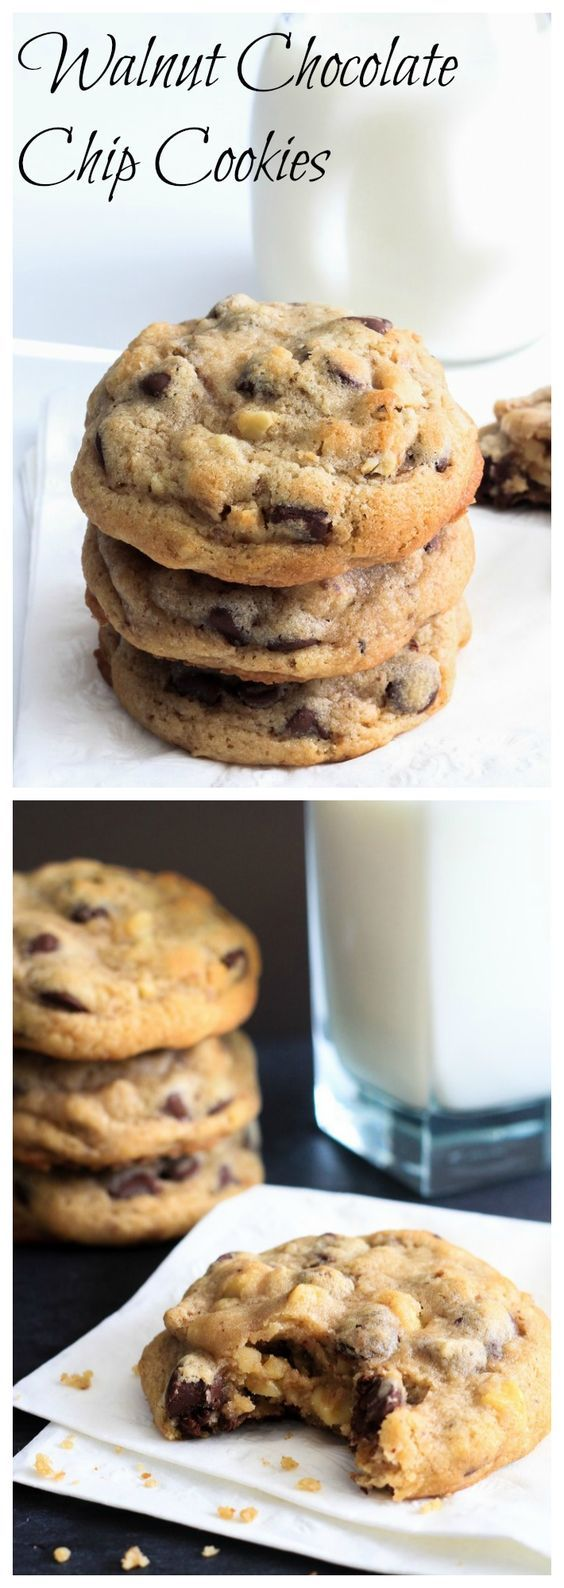 Walnut Chocolate Chip Cookies Recipe